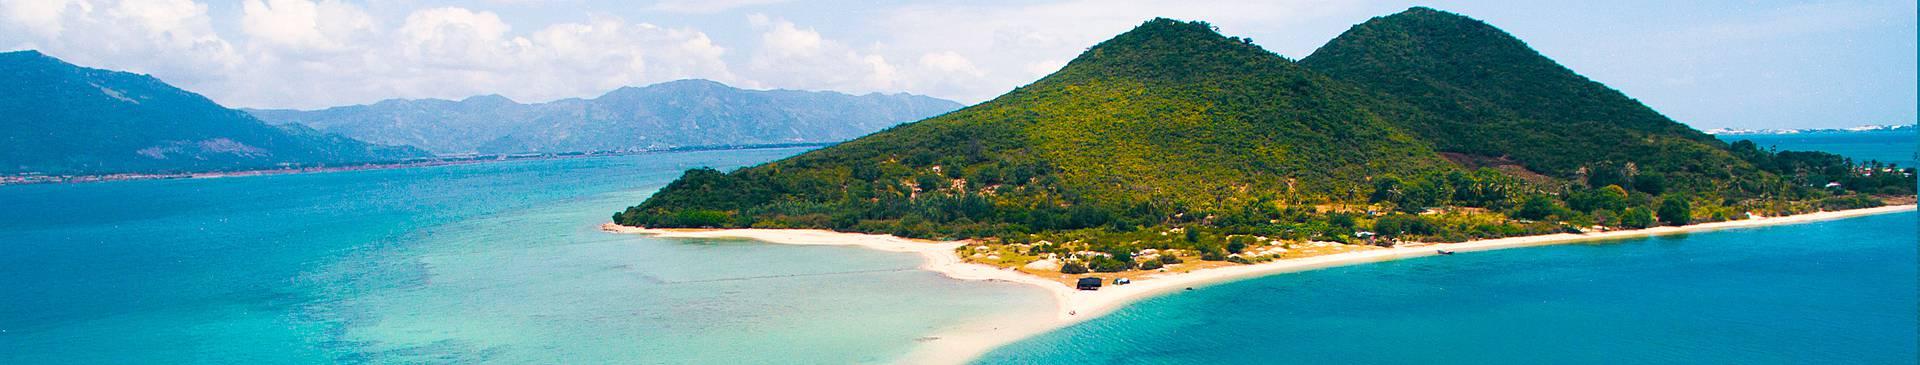 Island tours in Vietnam